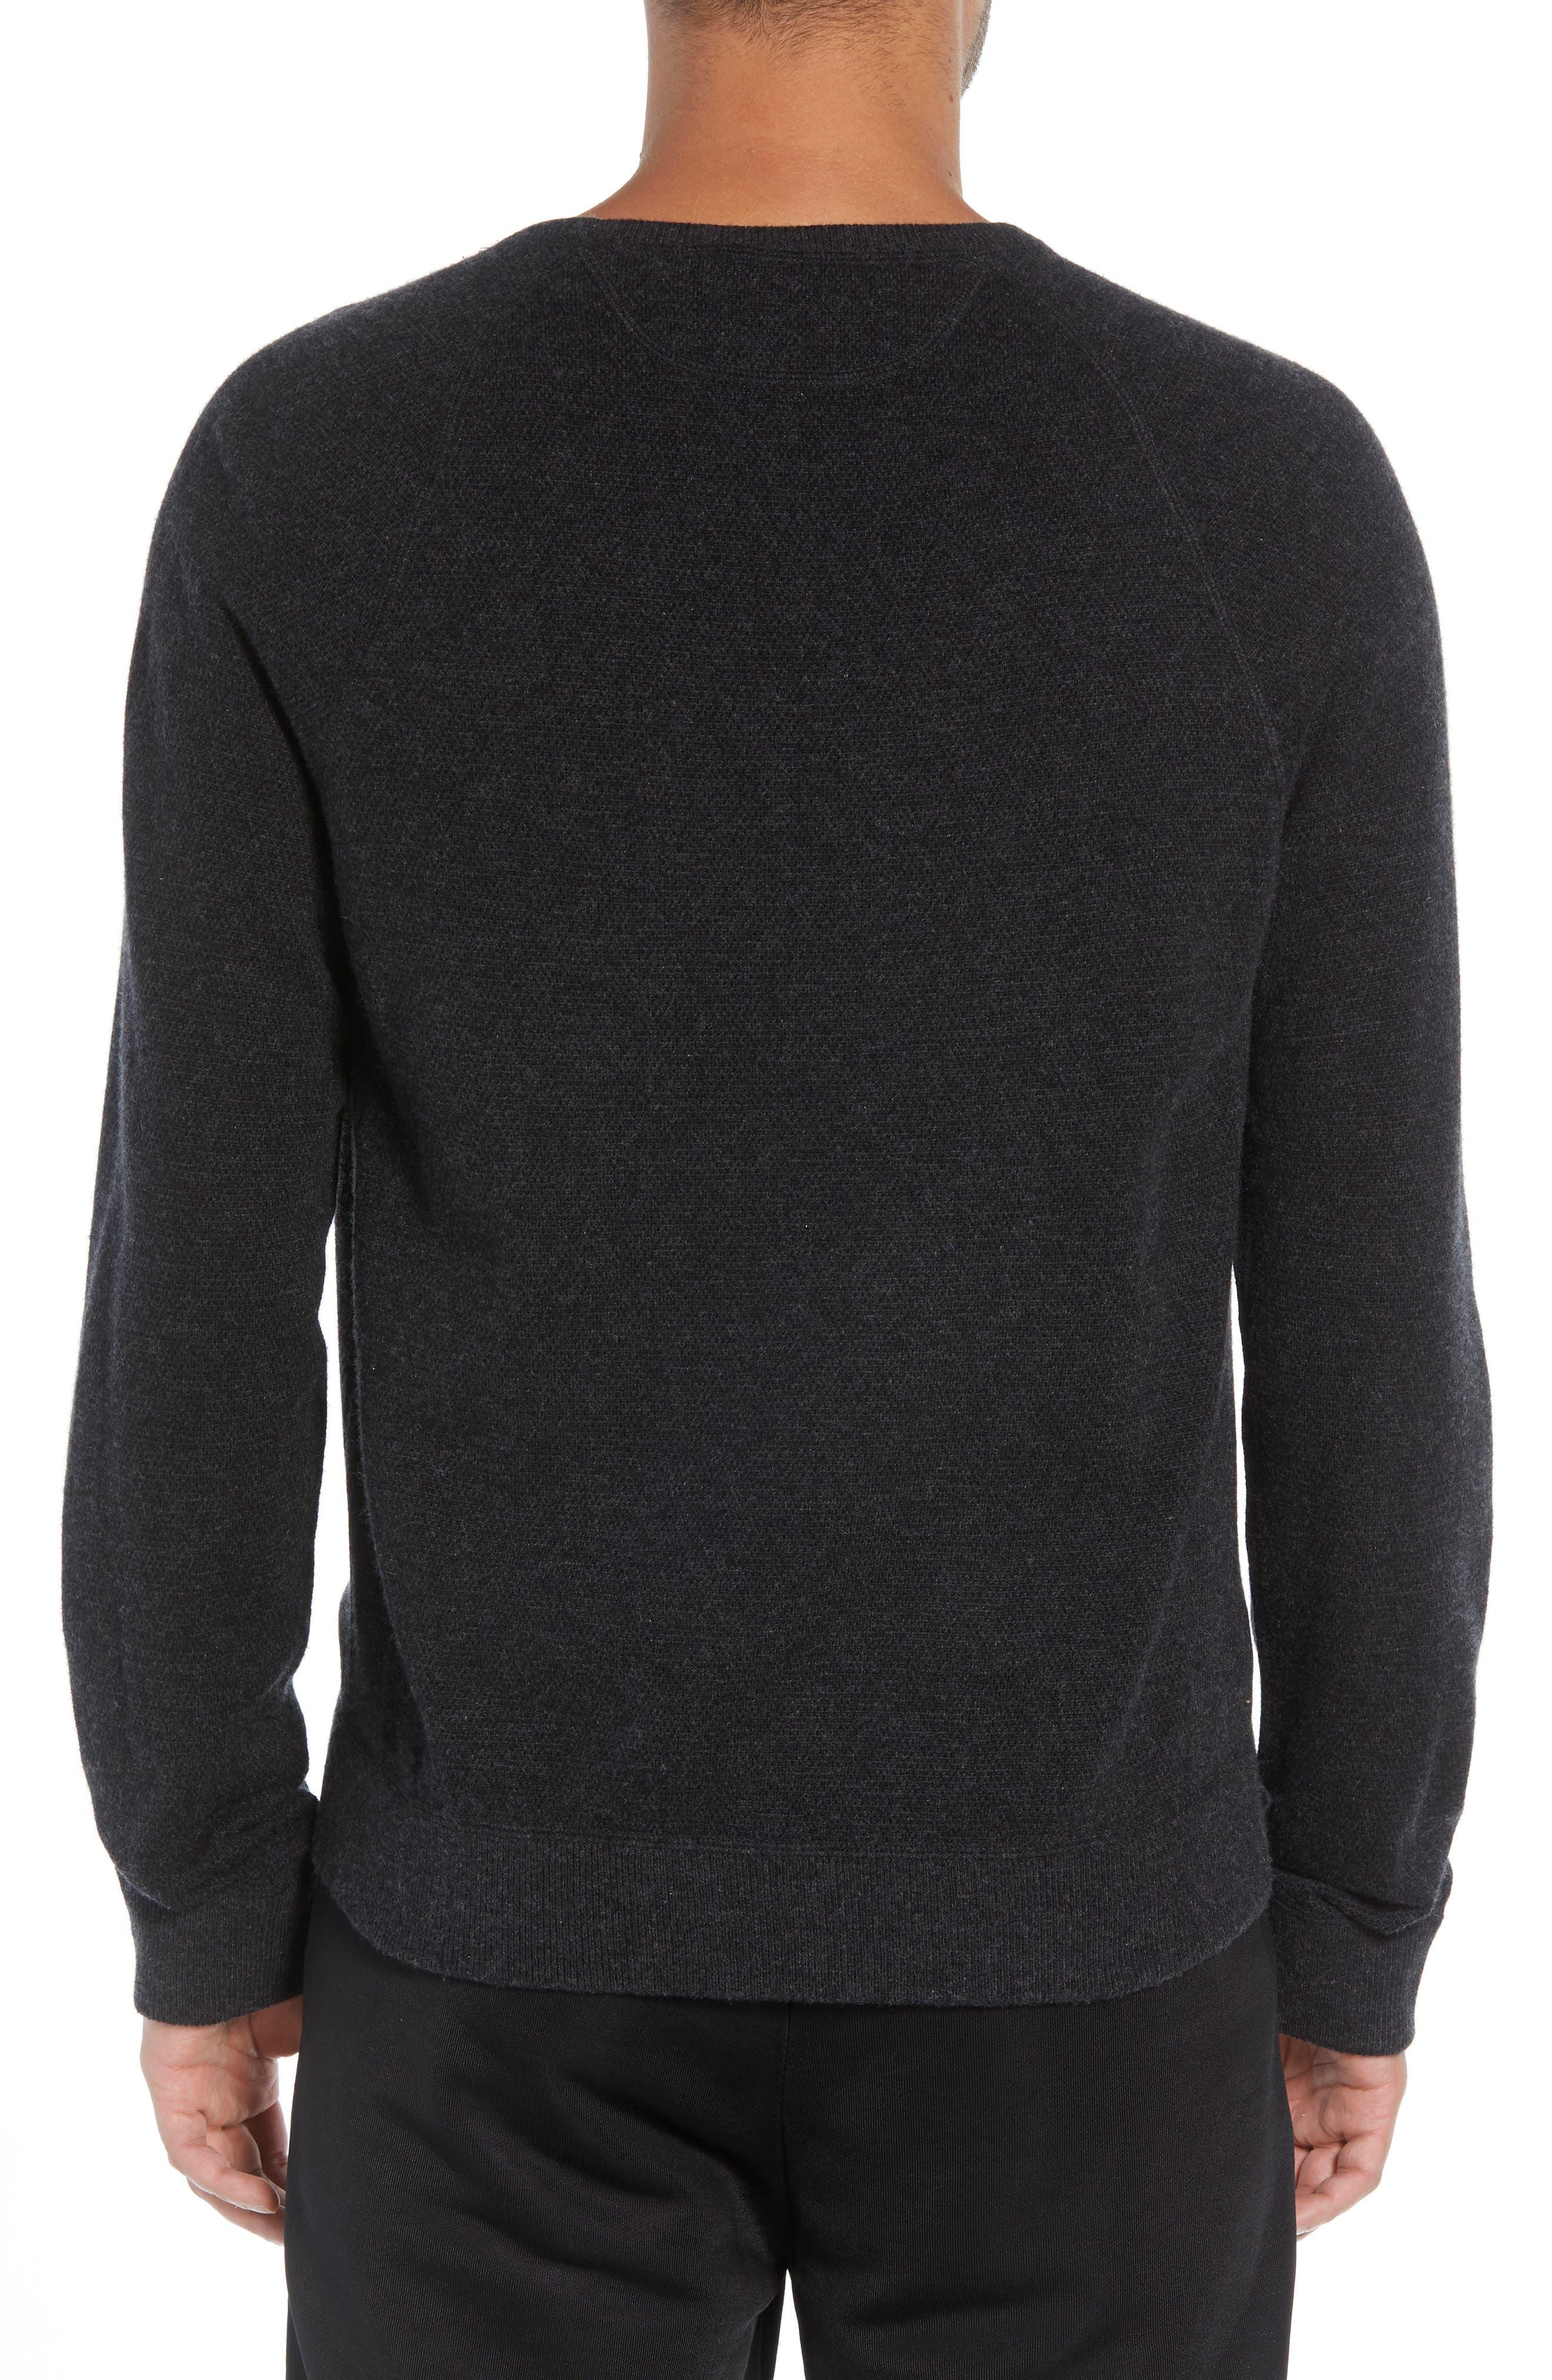 Bird's Eye Sweater,                             Alternate thumbnail 2, color,                             H CHARCOAL/ BLACK